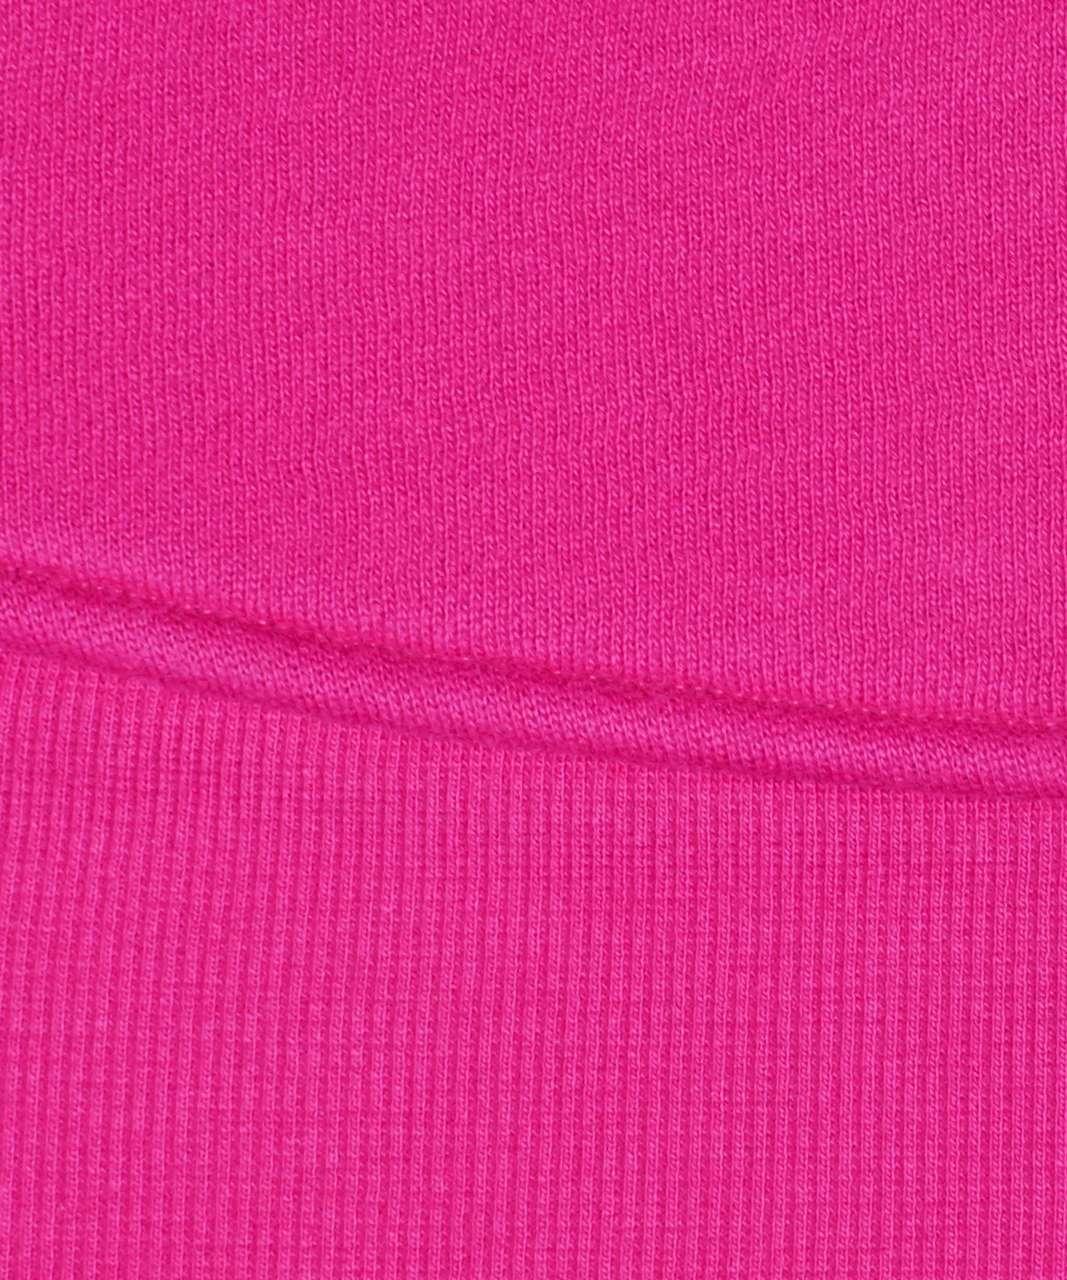 Lululemon Scuba Hoodie *Light Cotton Fleece - Fantom Fuchsia